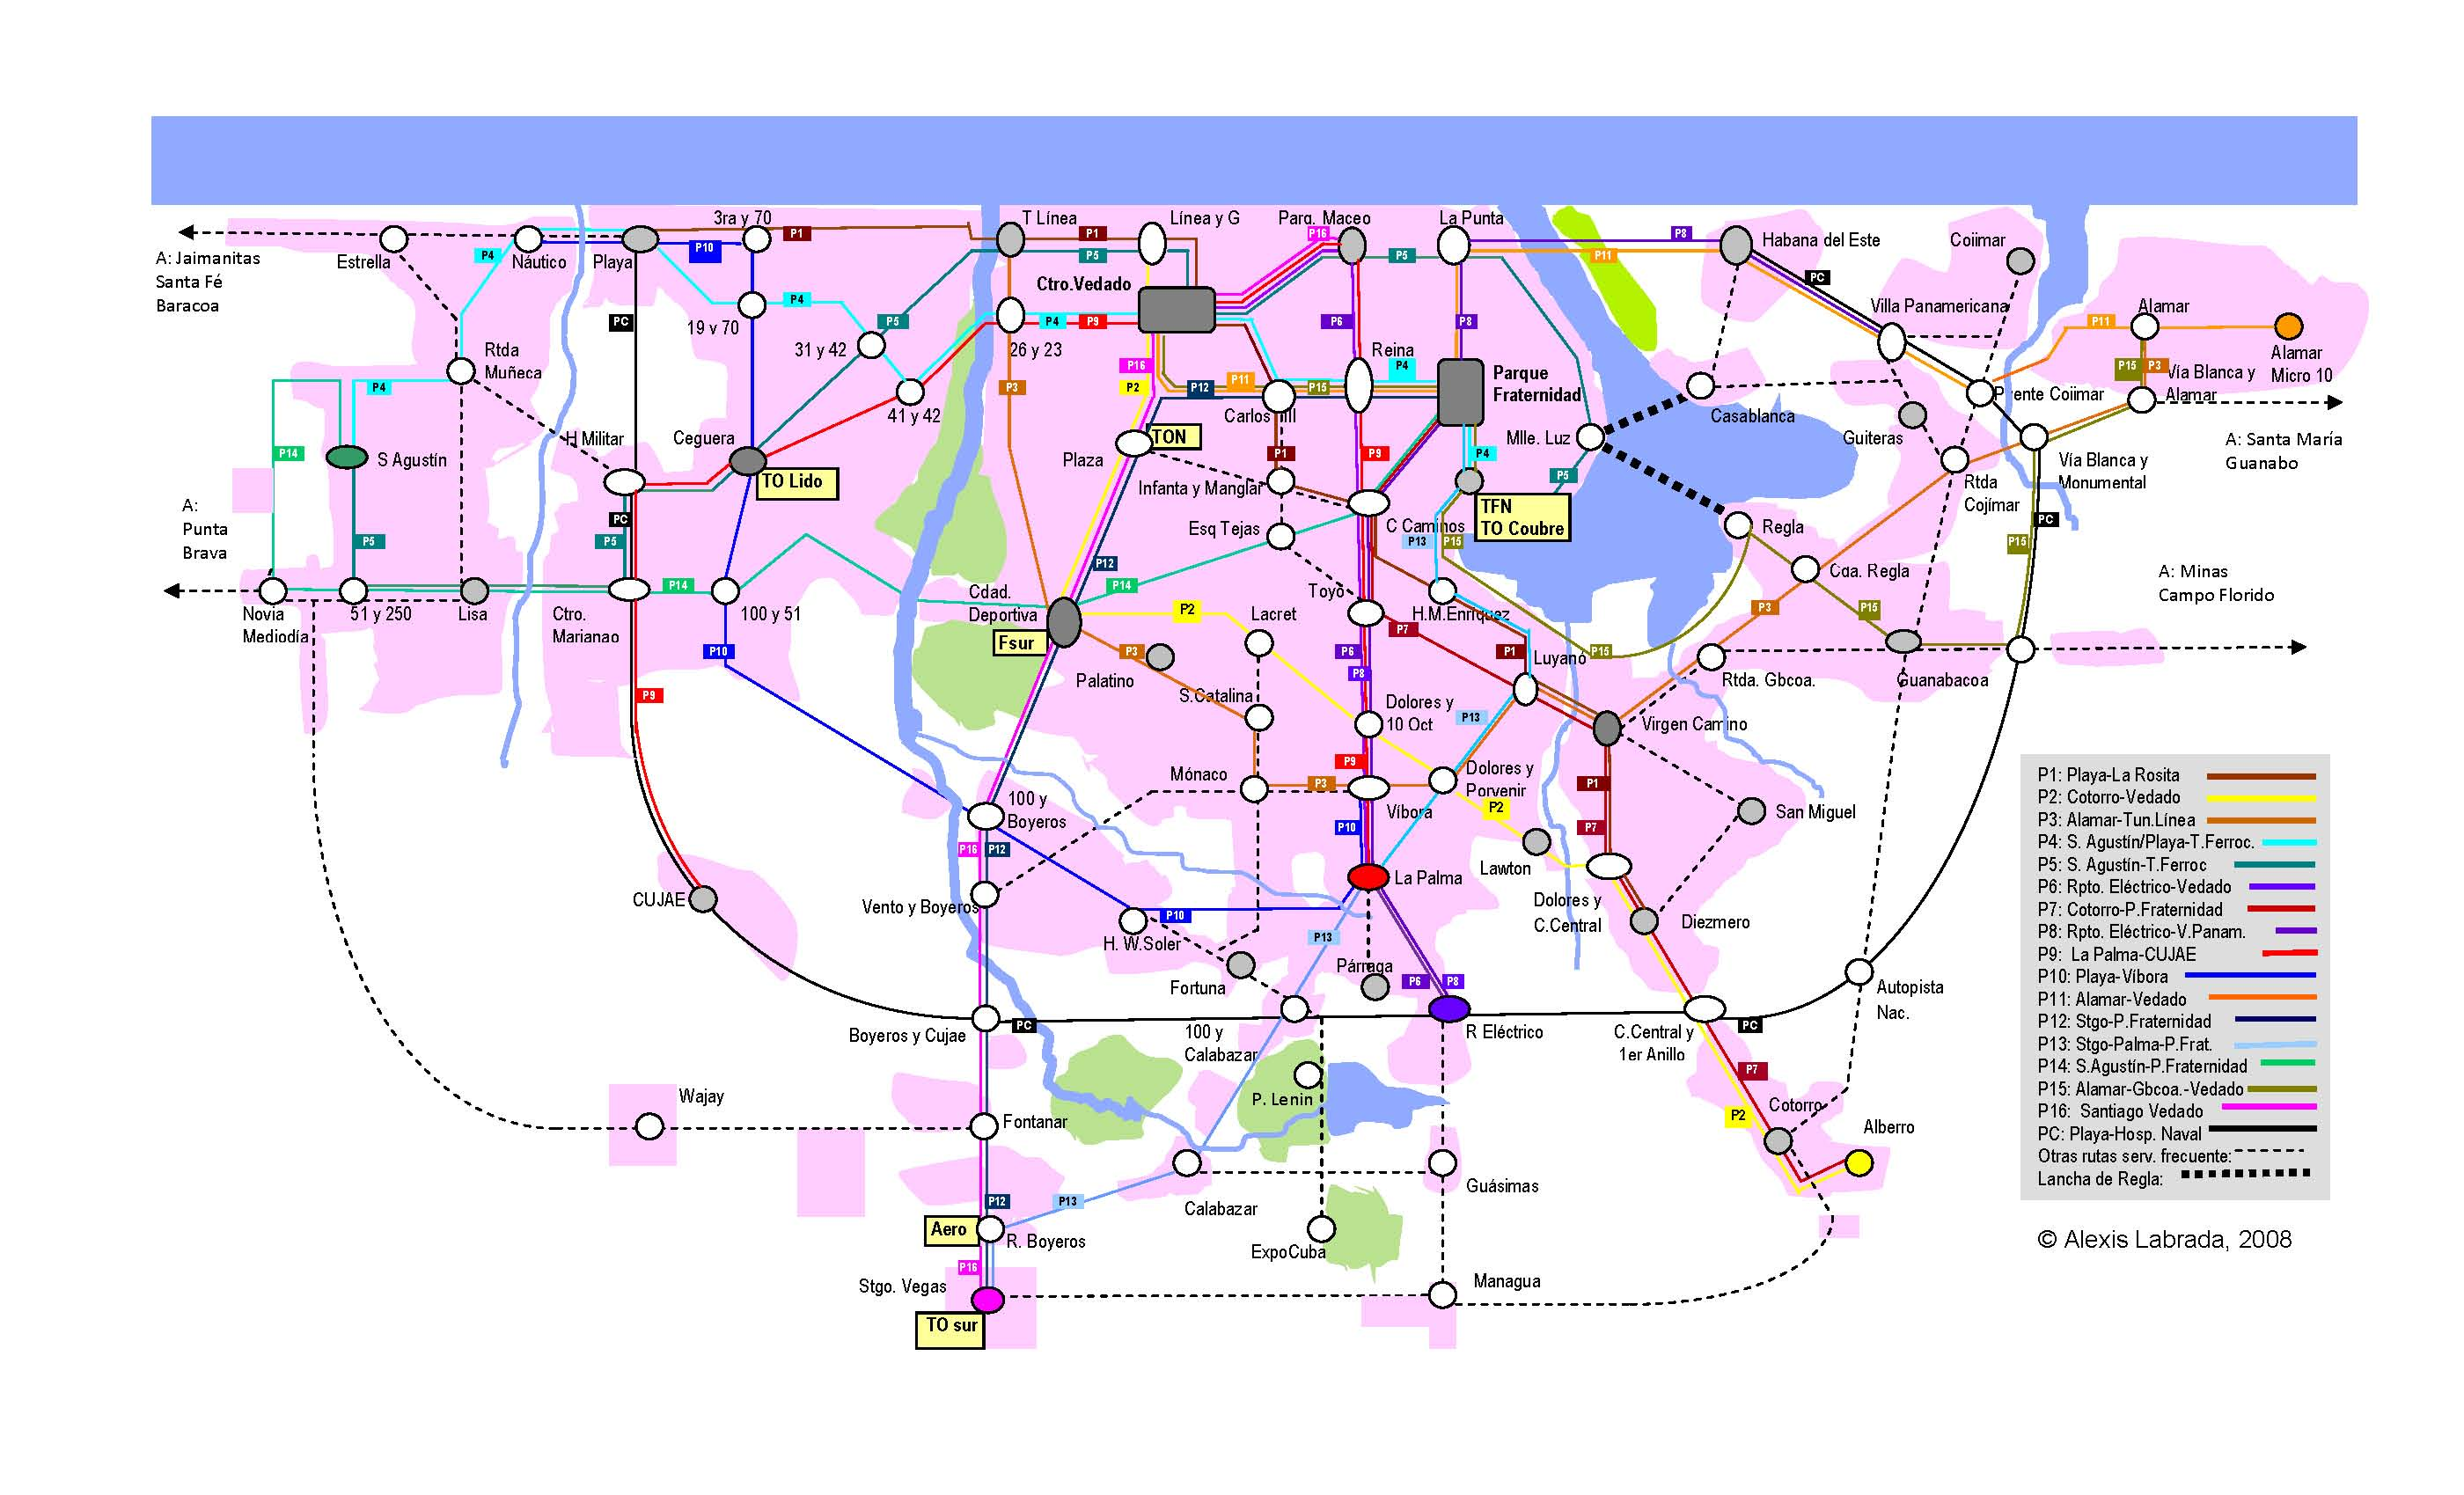 Plano rutas del MetroBus de La Habana Куба: виза, деньги, транспорт, посольства, безопасность